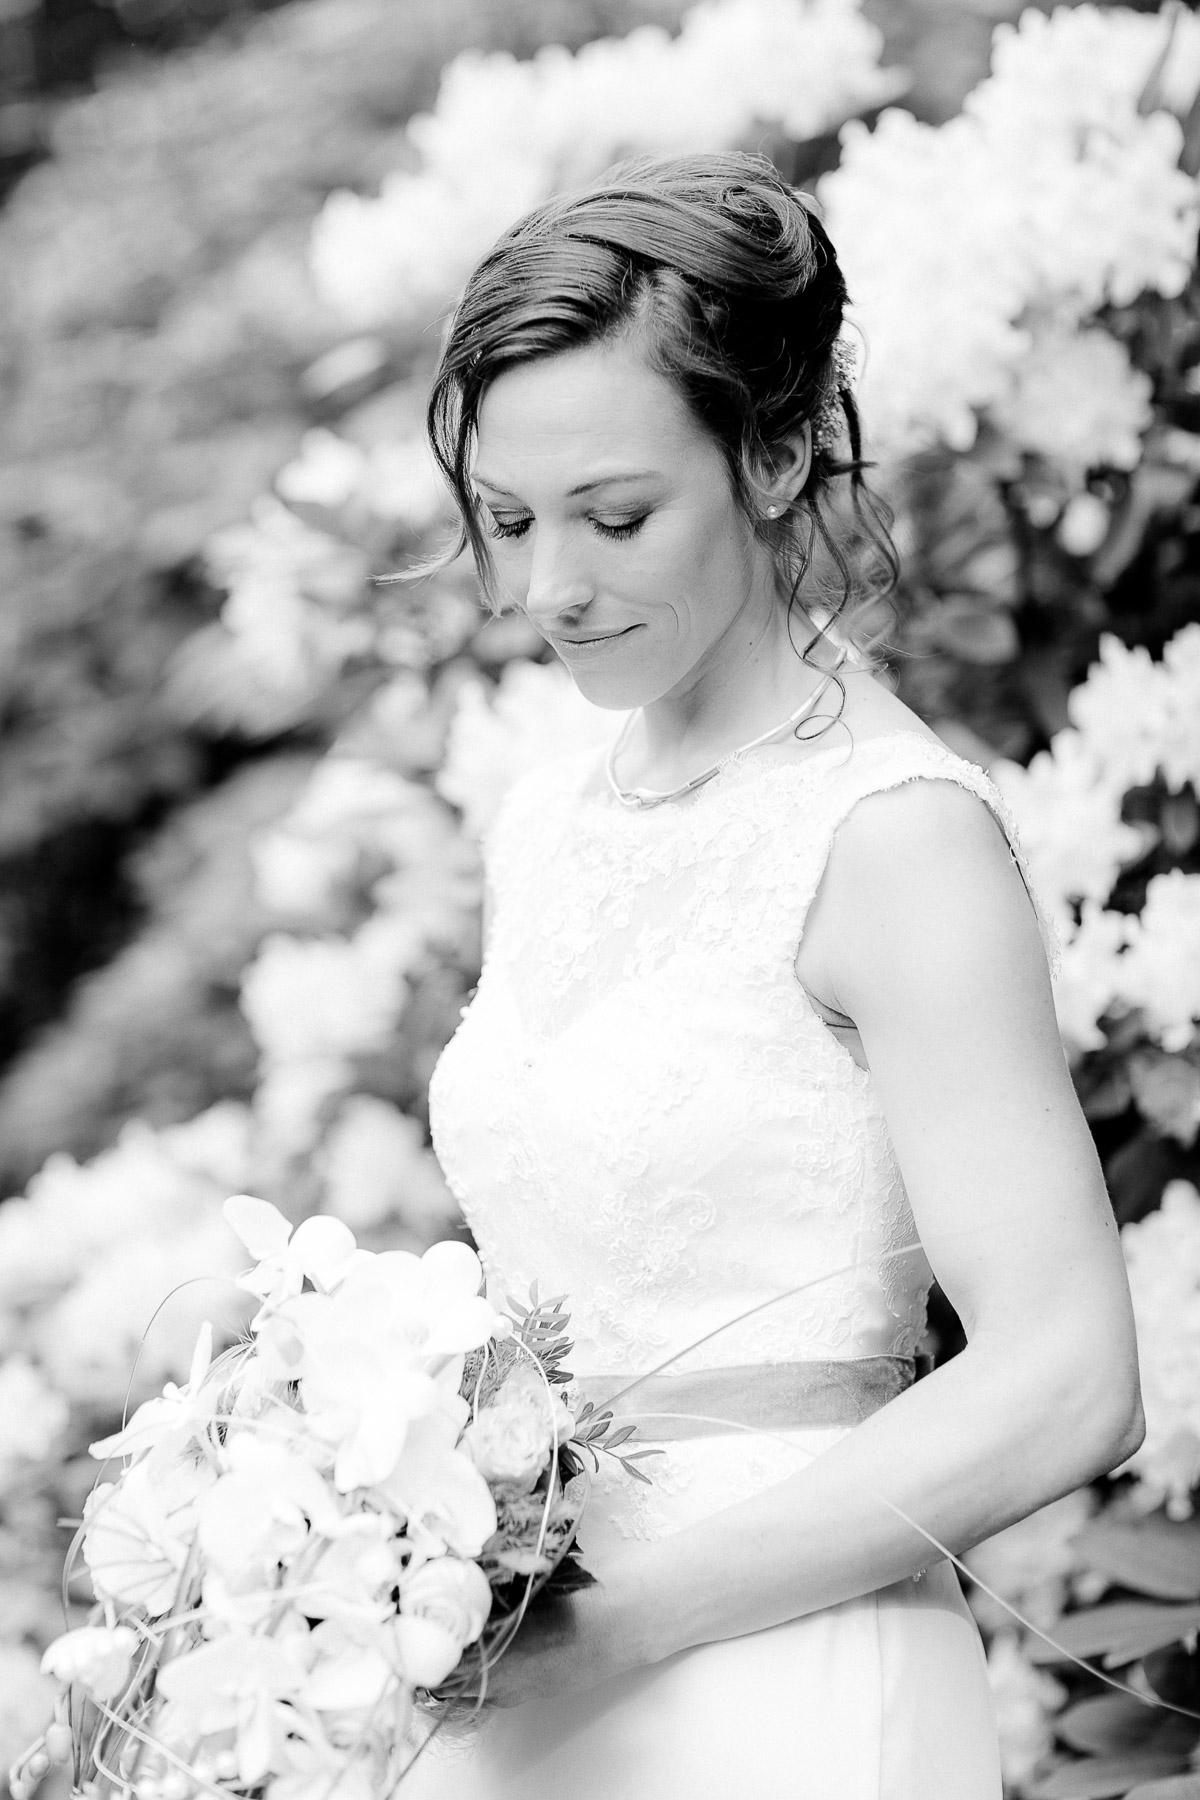 Hochzeitsfotograf-Bielefeld-2015-05-07-2-1